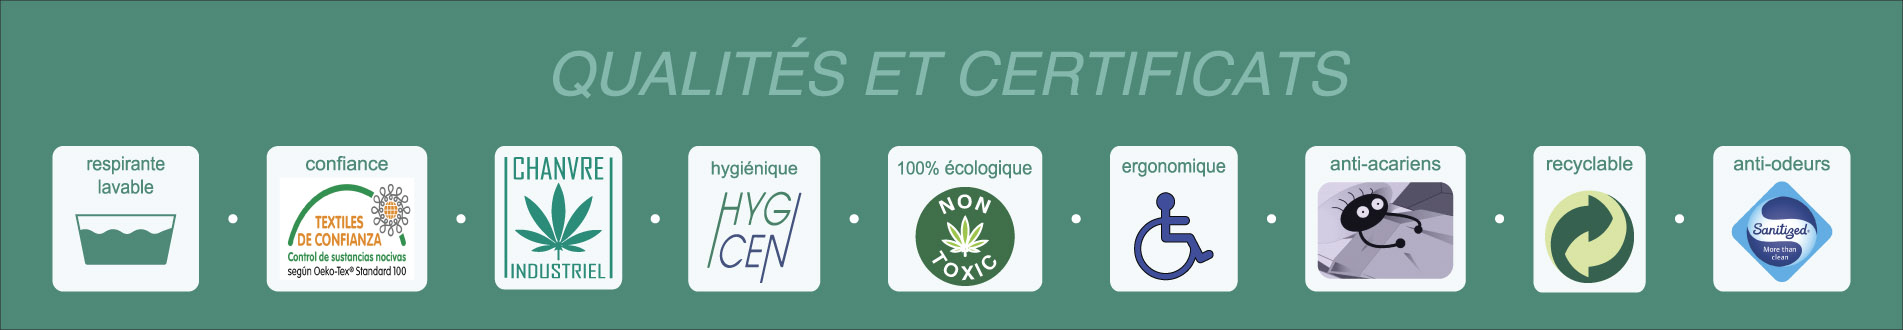 qualités et certificats cannarelax